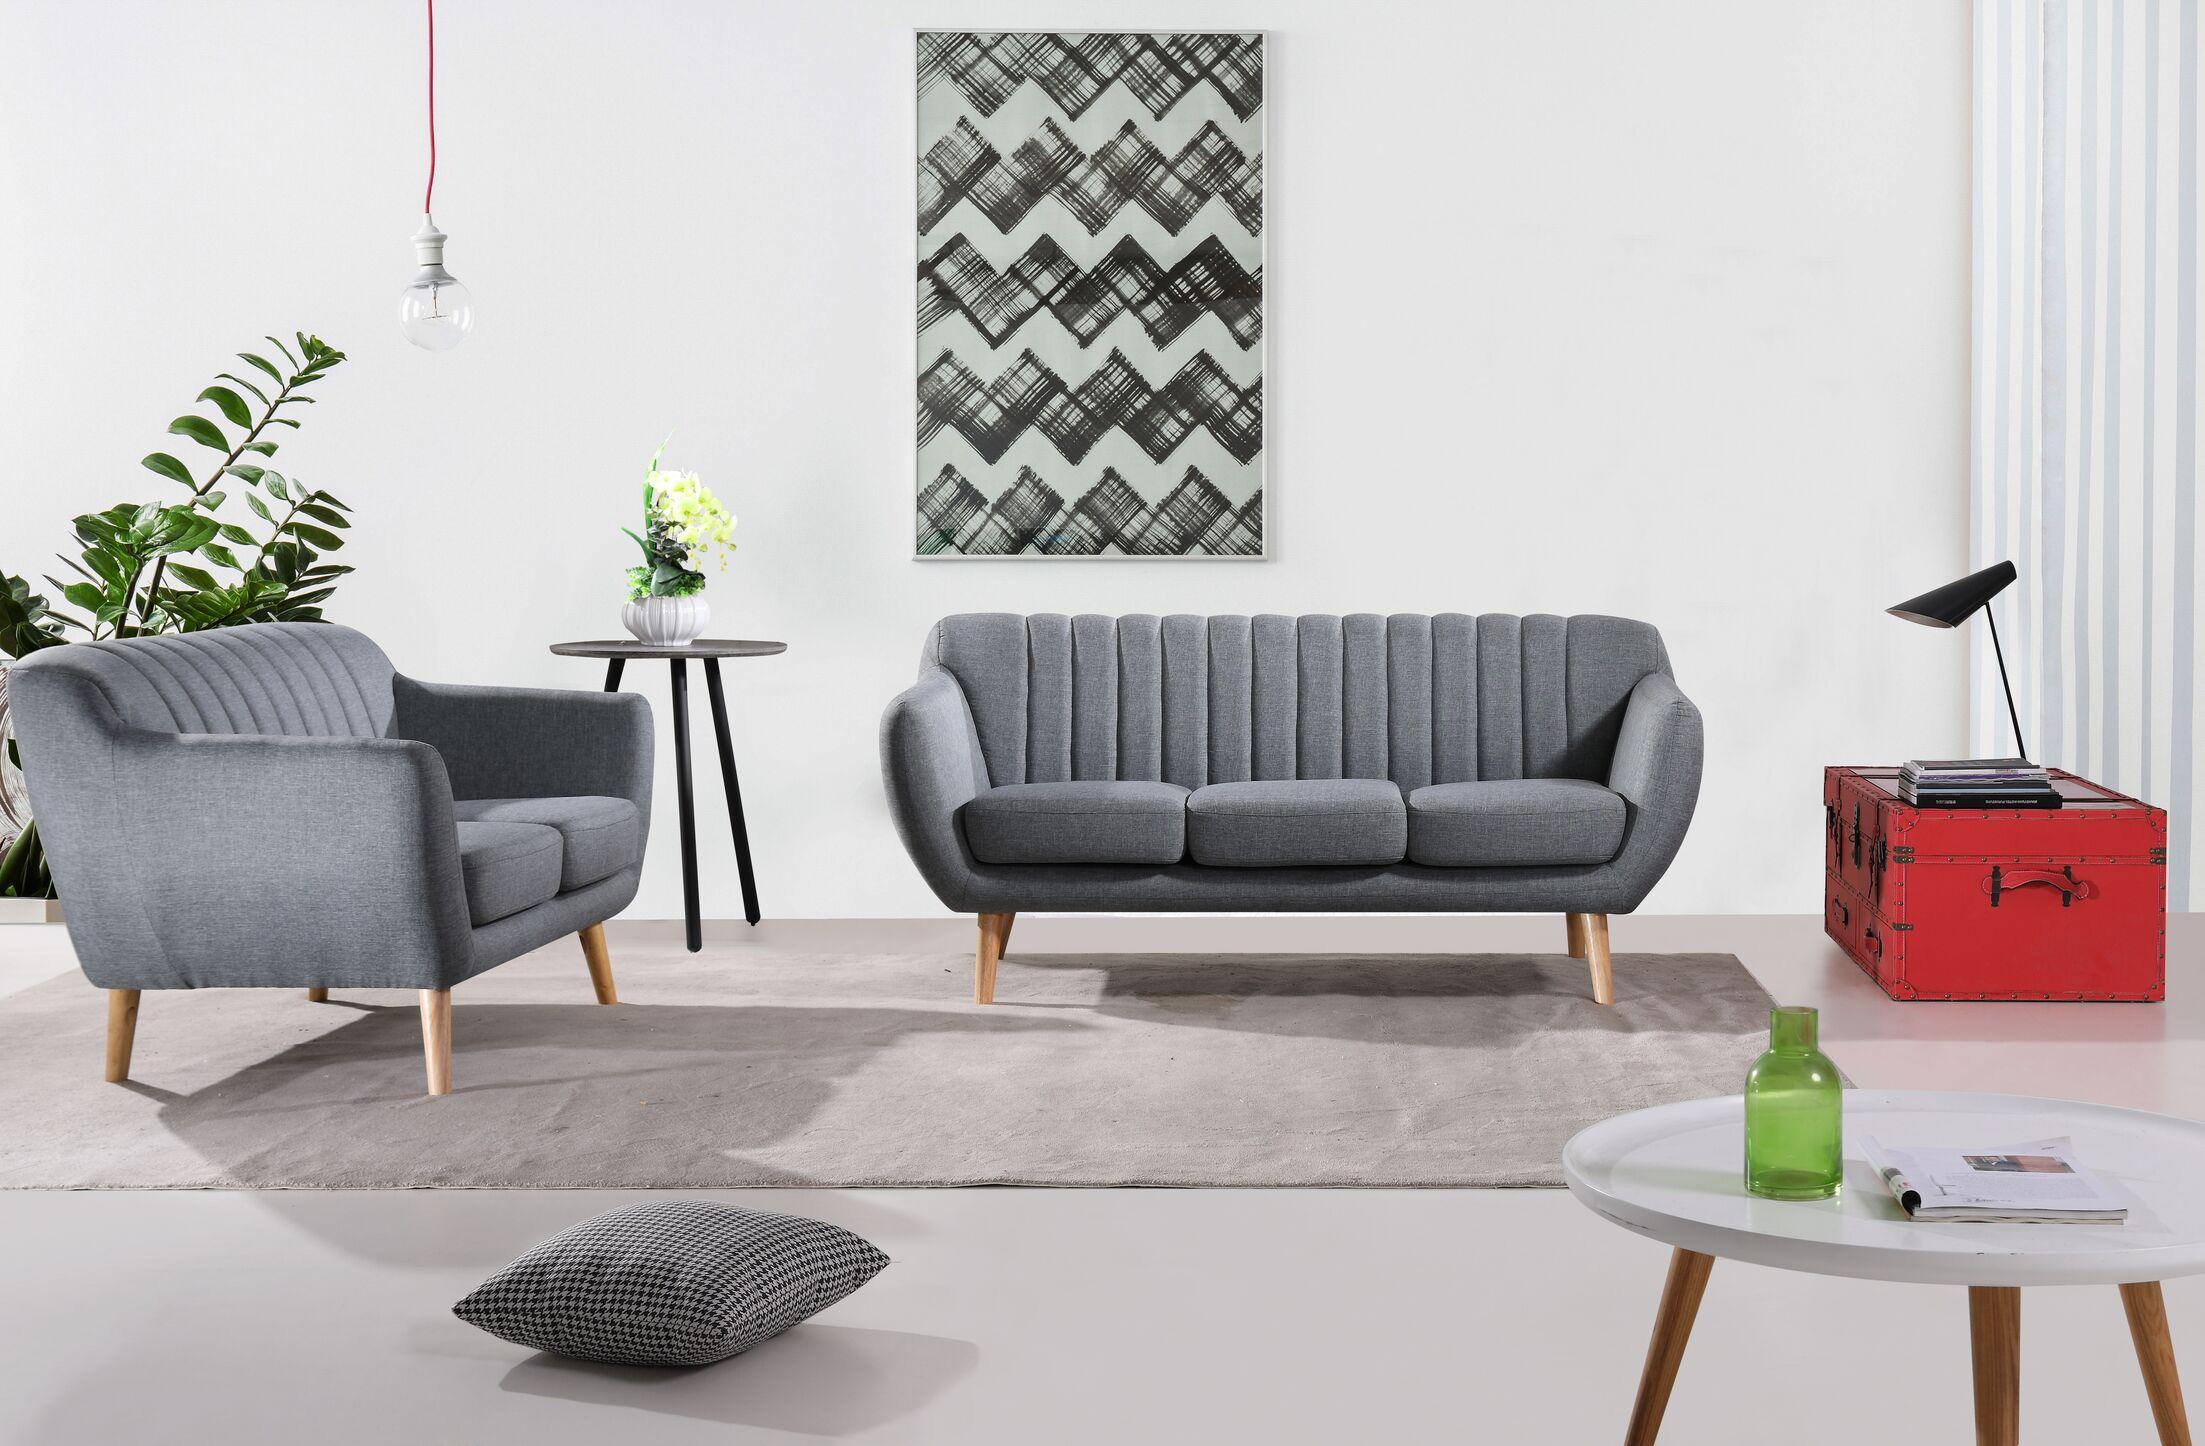 Jon 2 Piece Living Room Set (Set of 2) Upholstery: Dark Gray